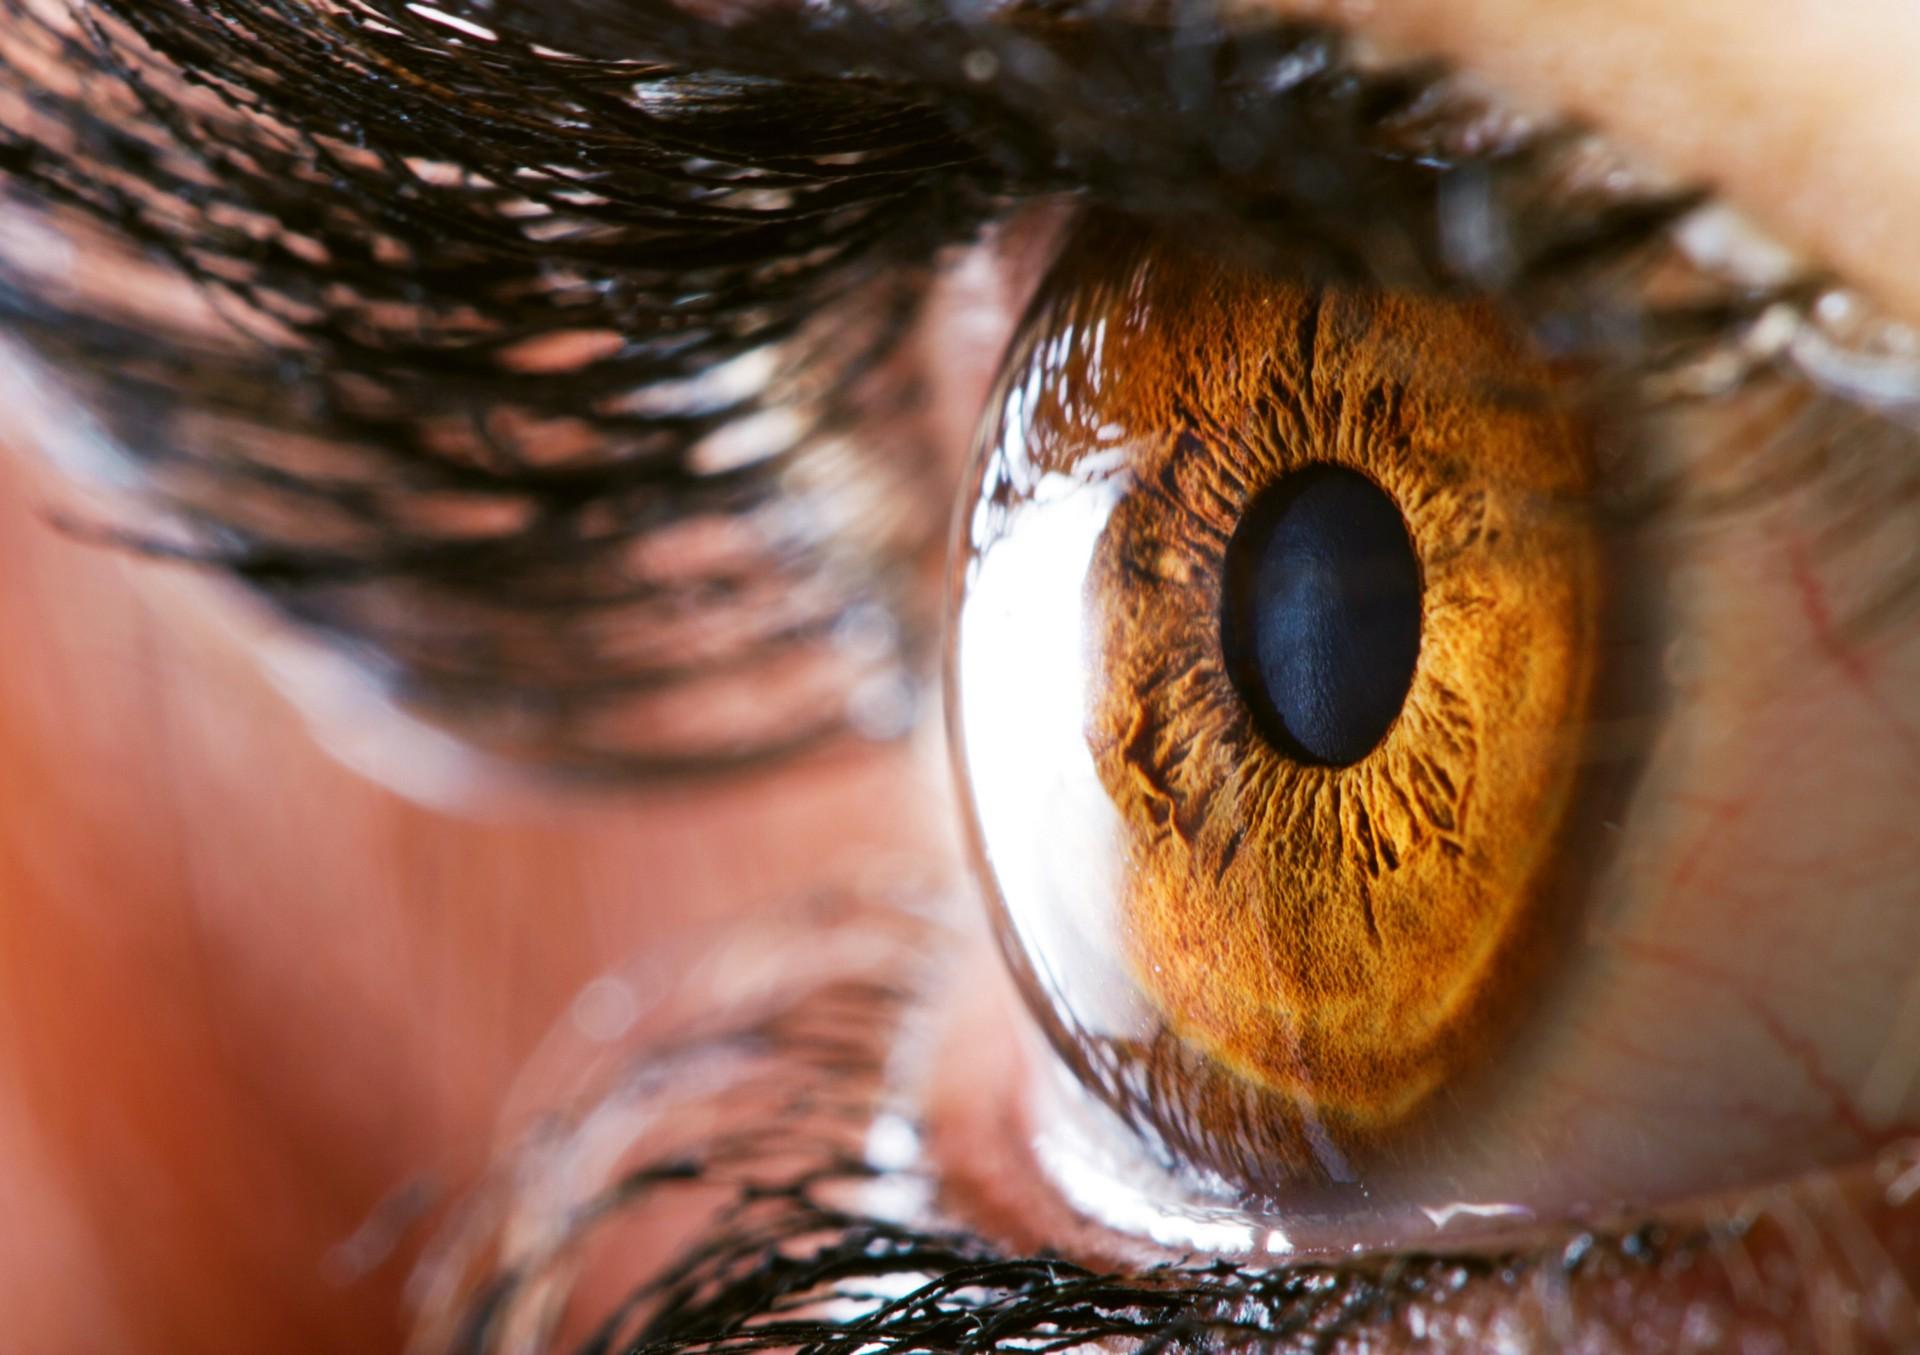 Woman Gouged Out Own Eyeballs Near South Carolina Church